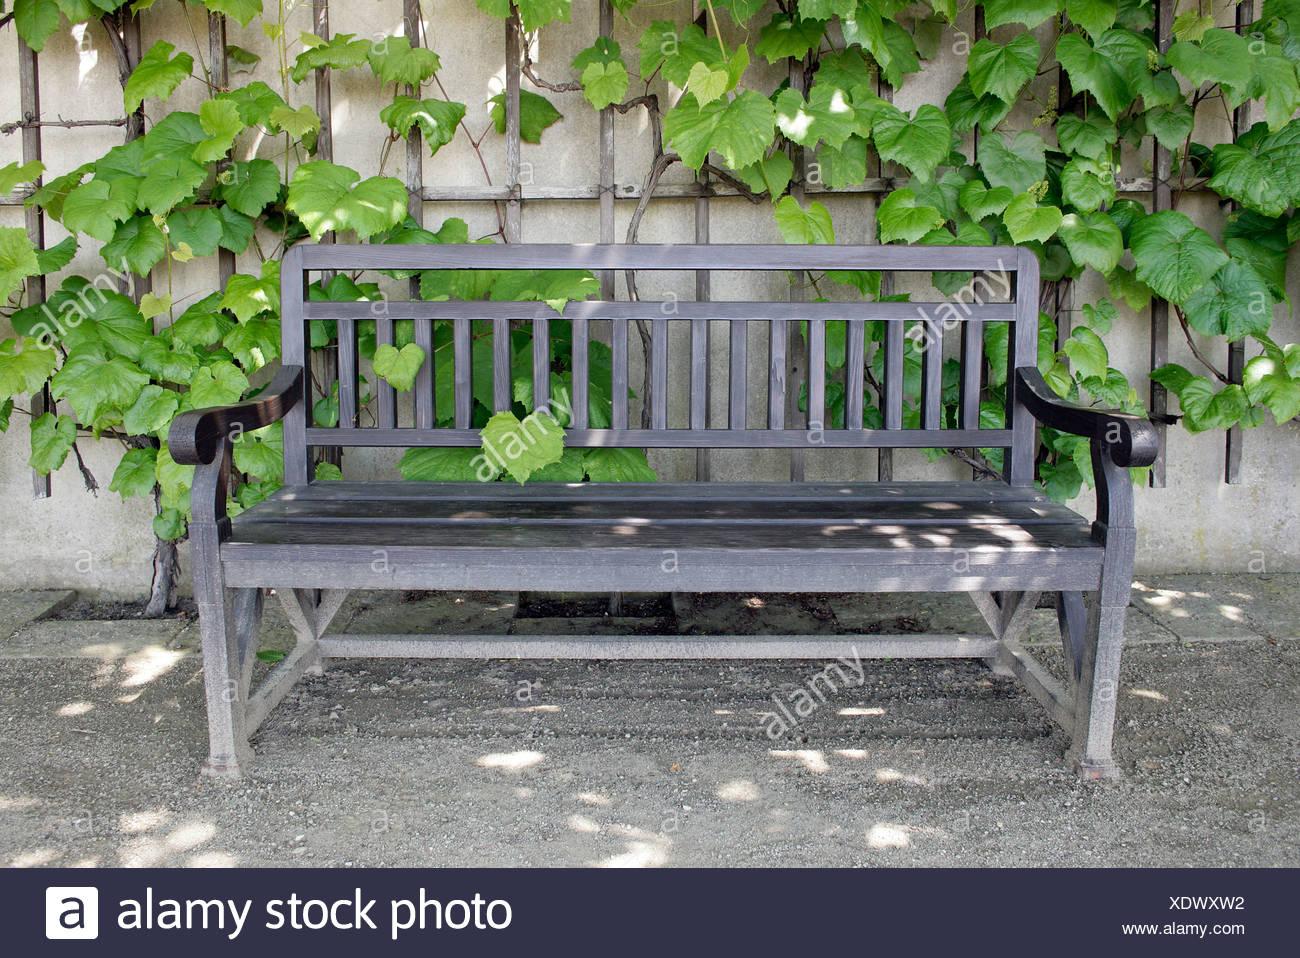 Bench in the royal vineyards, Mala Strana Gardens, Prague, Czech Republic, Europe Stock Photo